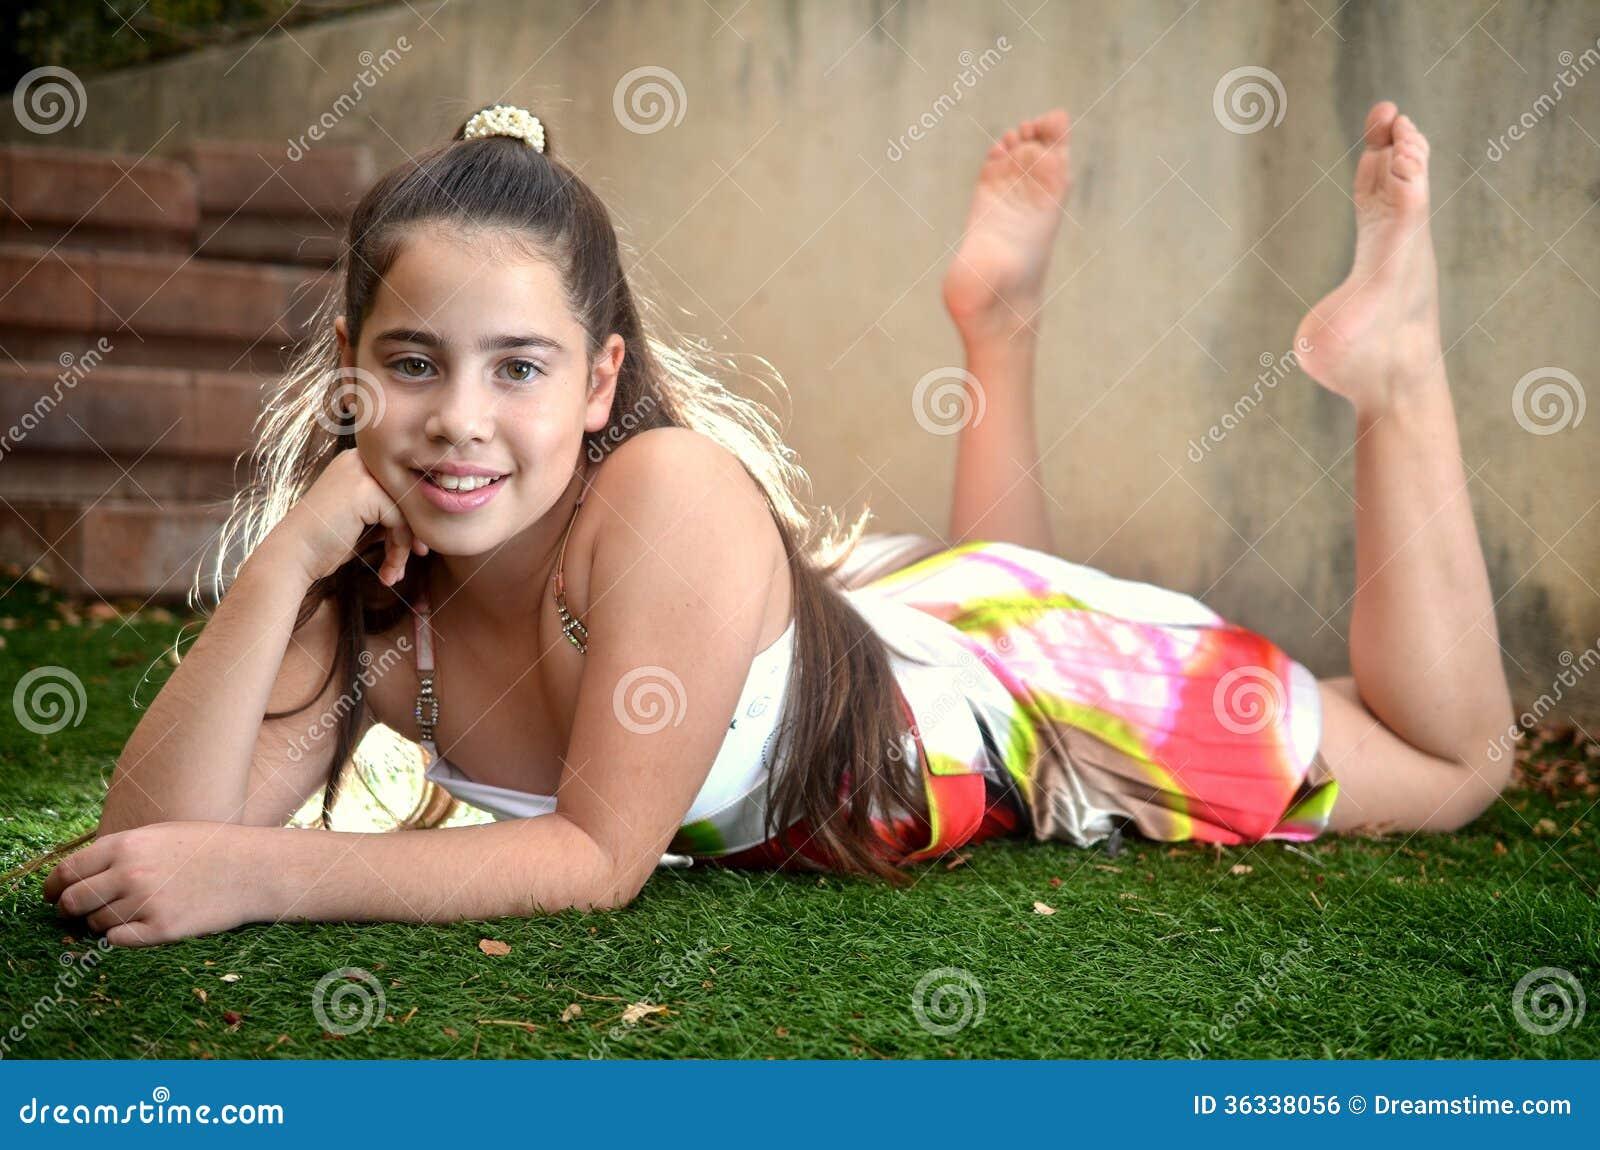 little lolita russian gallery young model kids 10 yo 12 yo